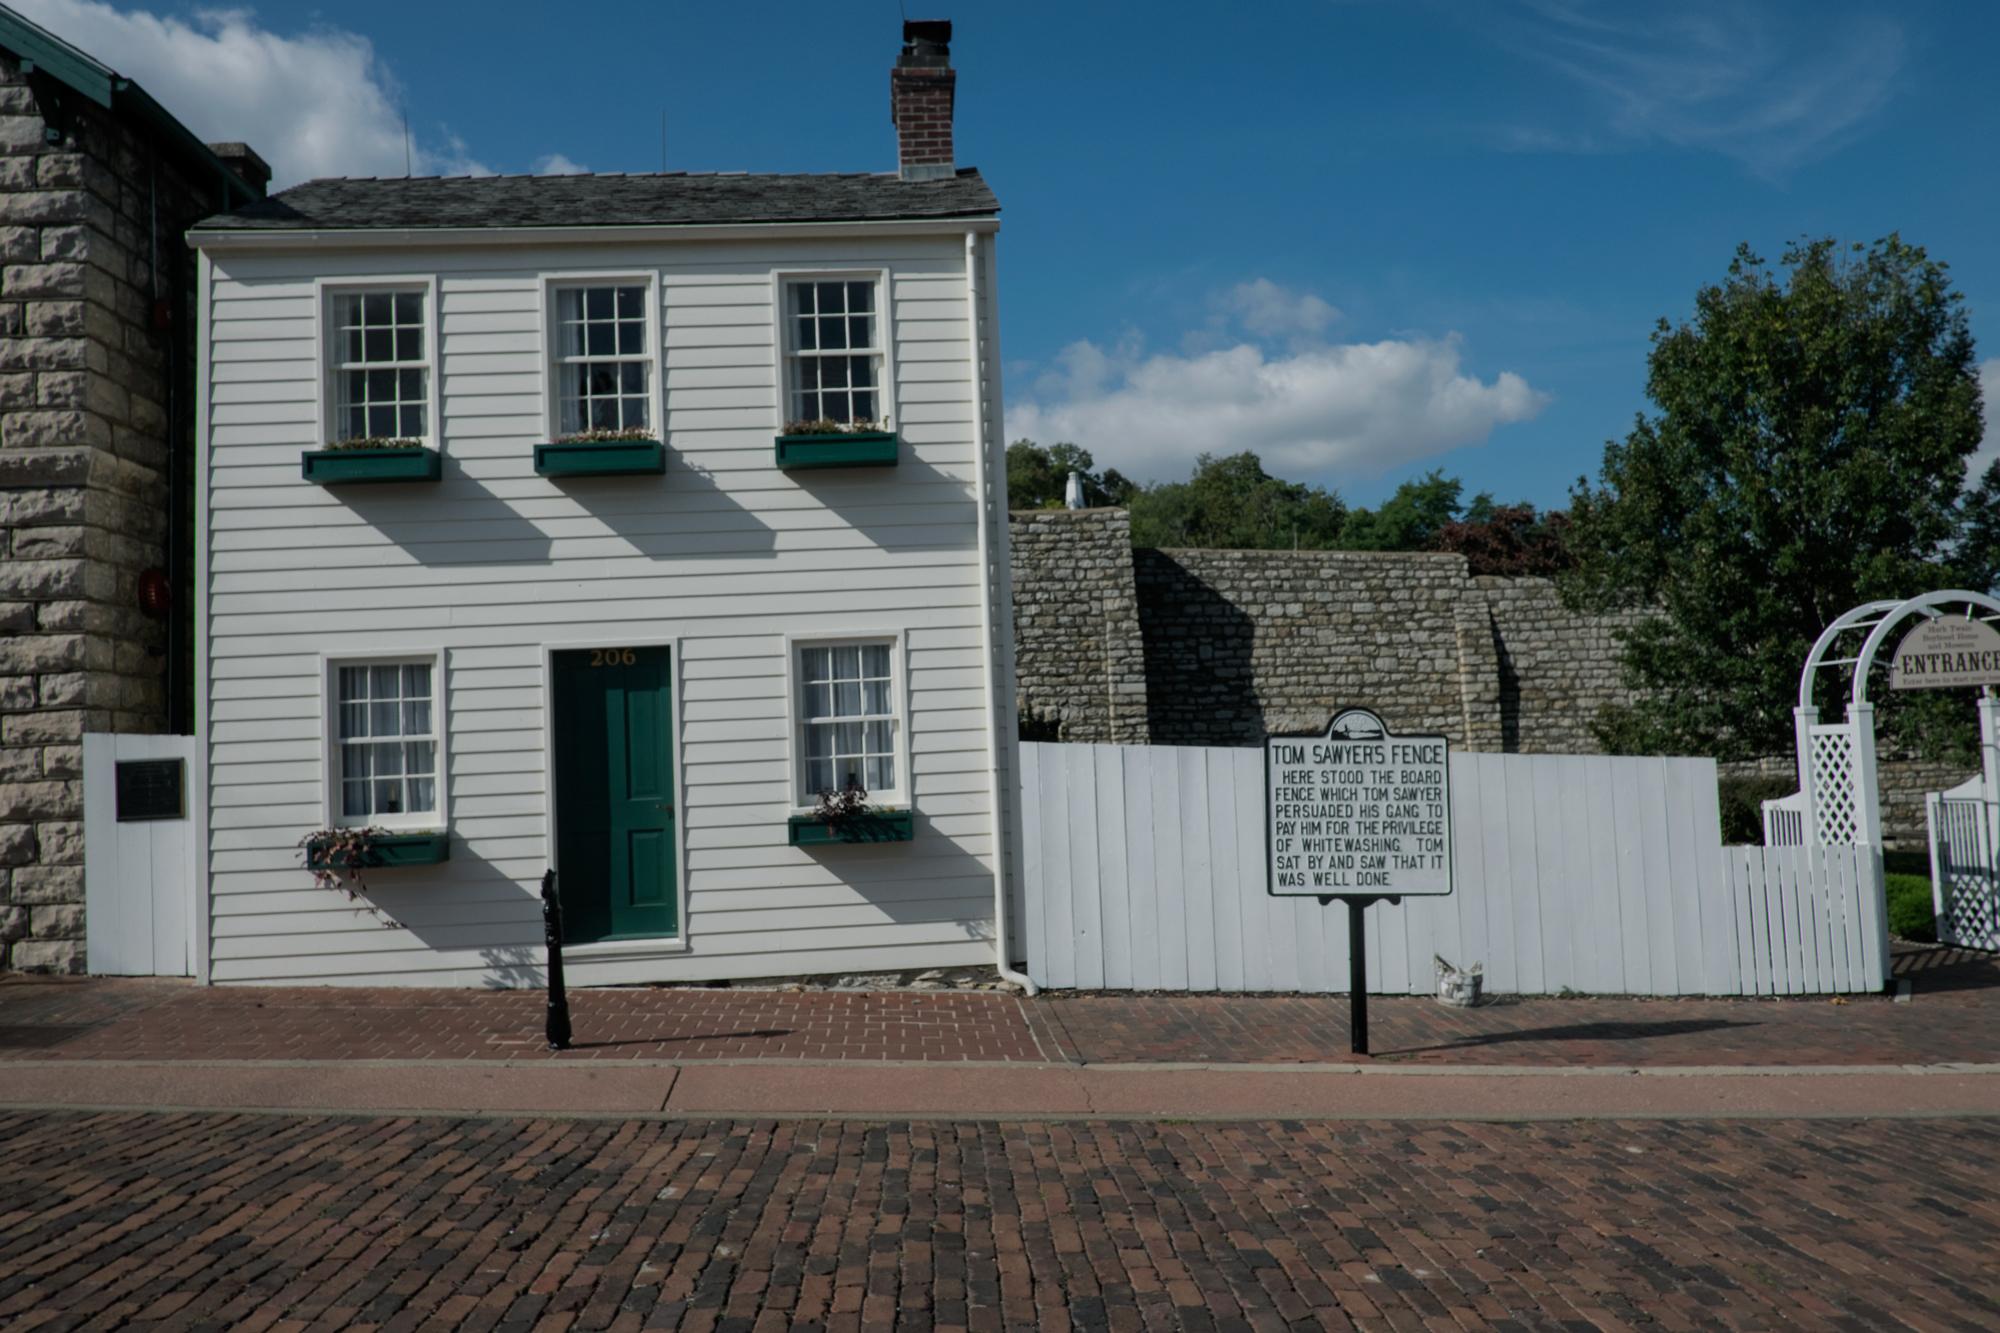 Mark Twain House and Museum, Hannibal, Missouri